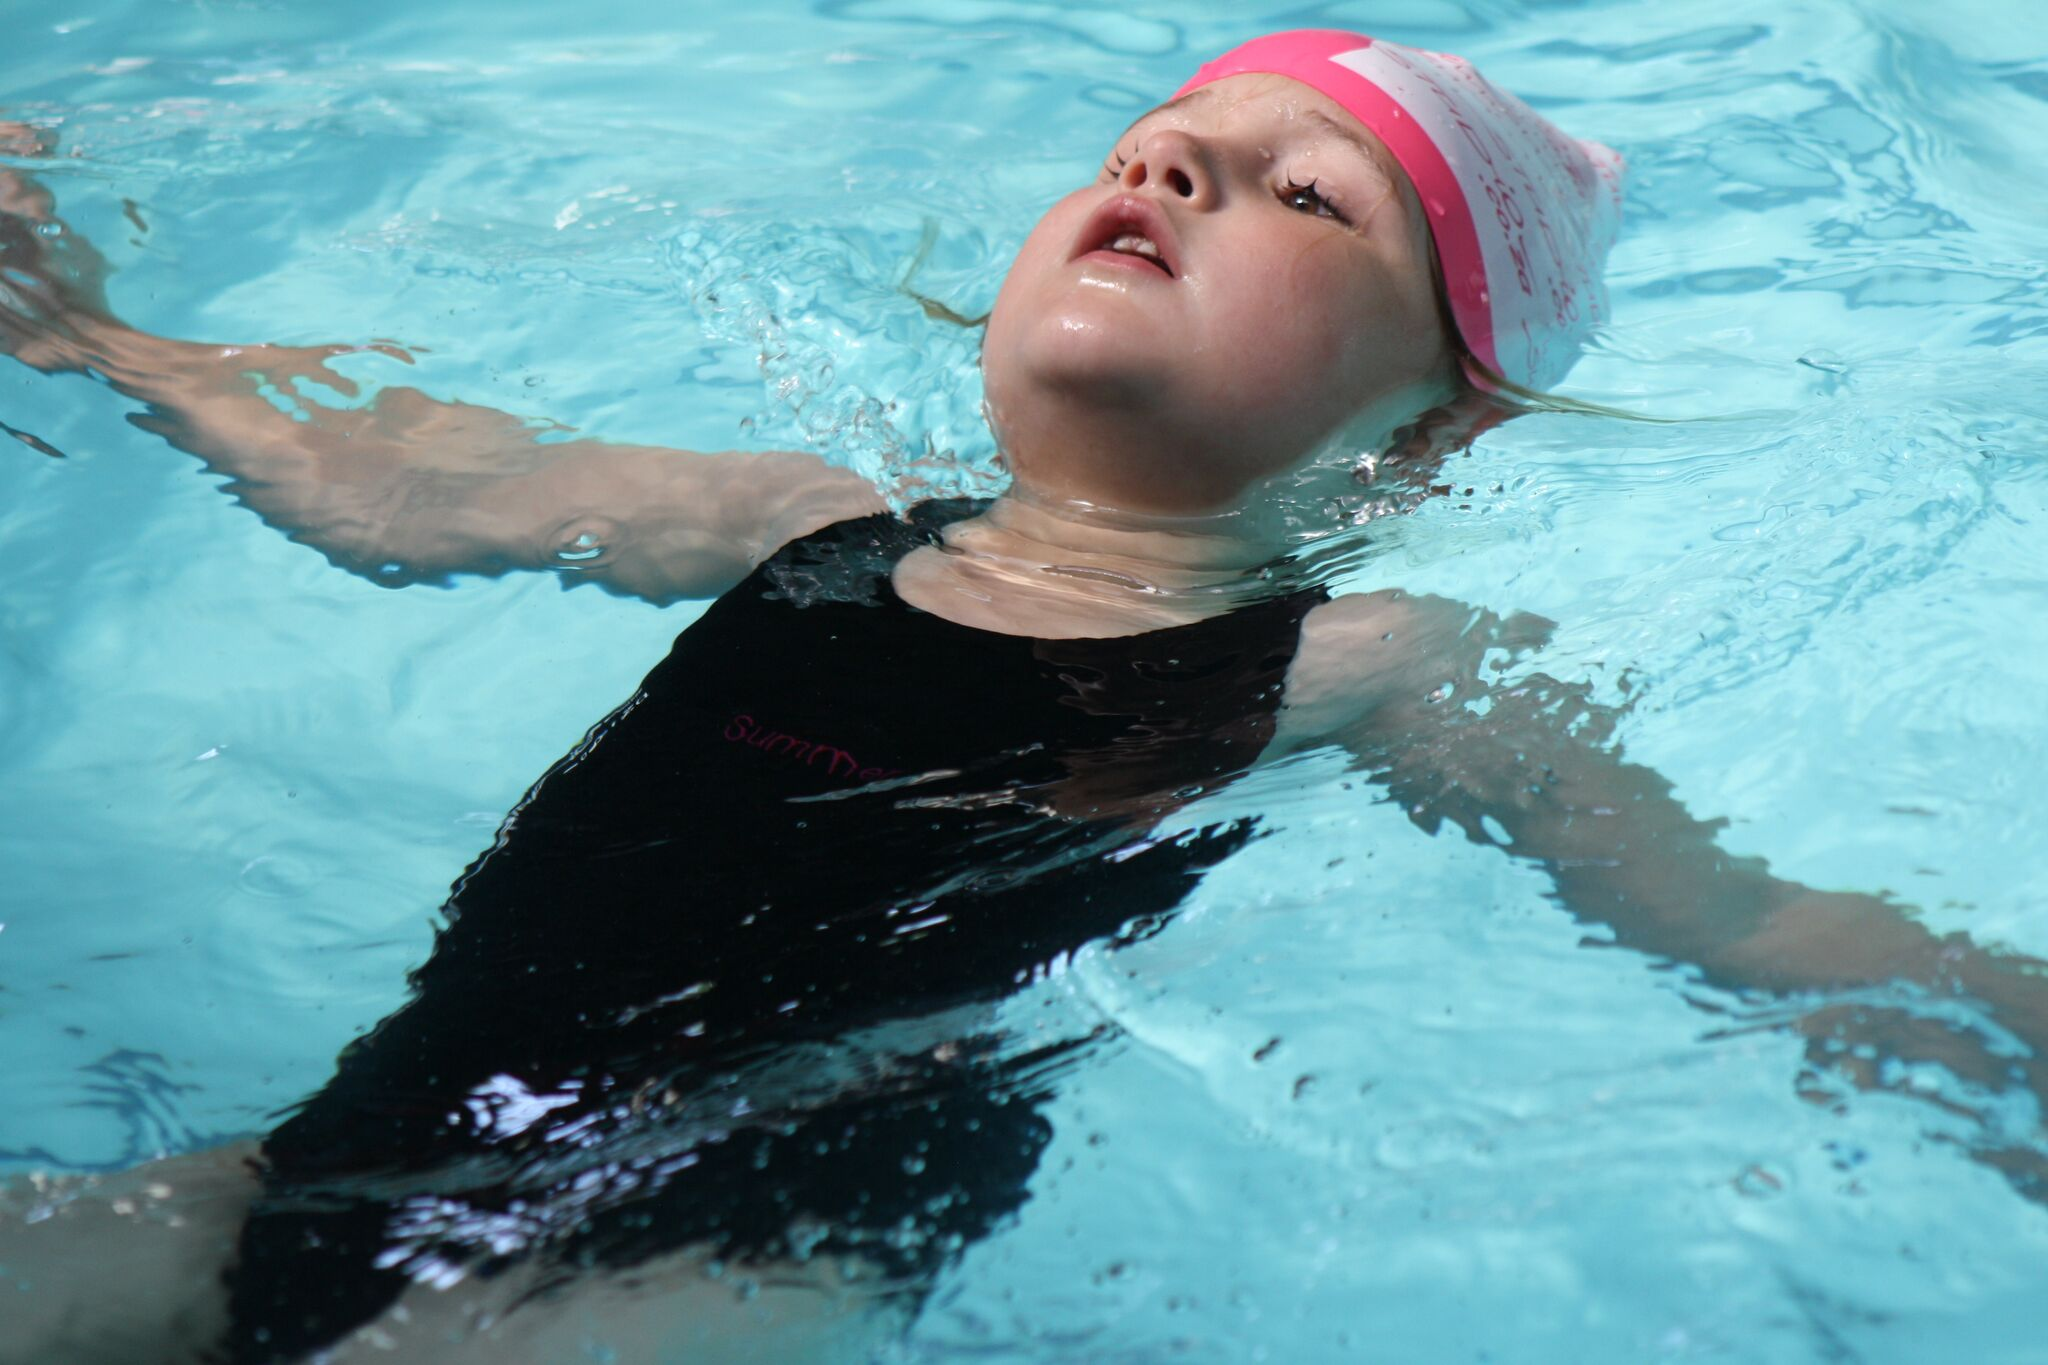 Swim Studio - Learn to swim